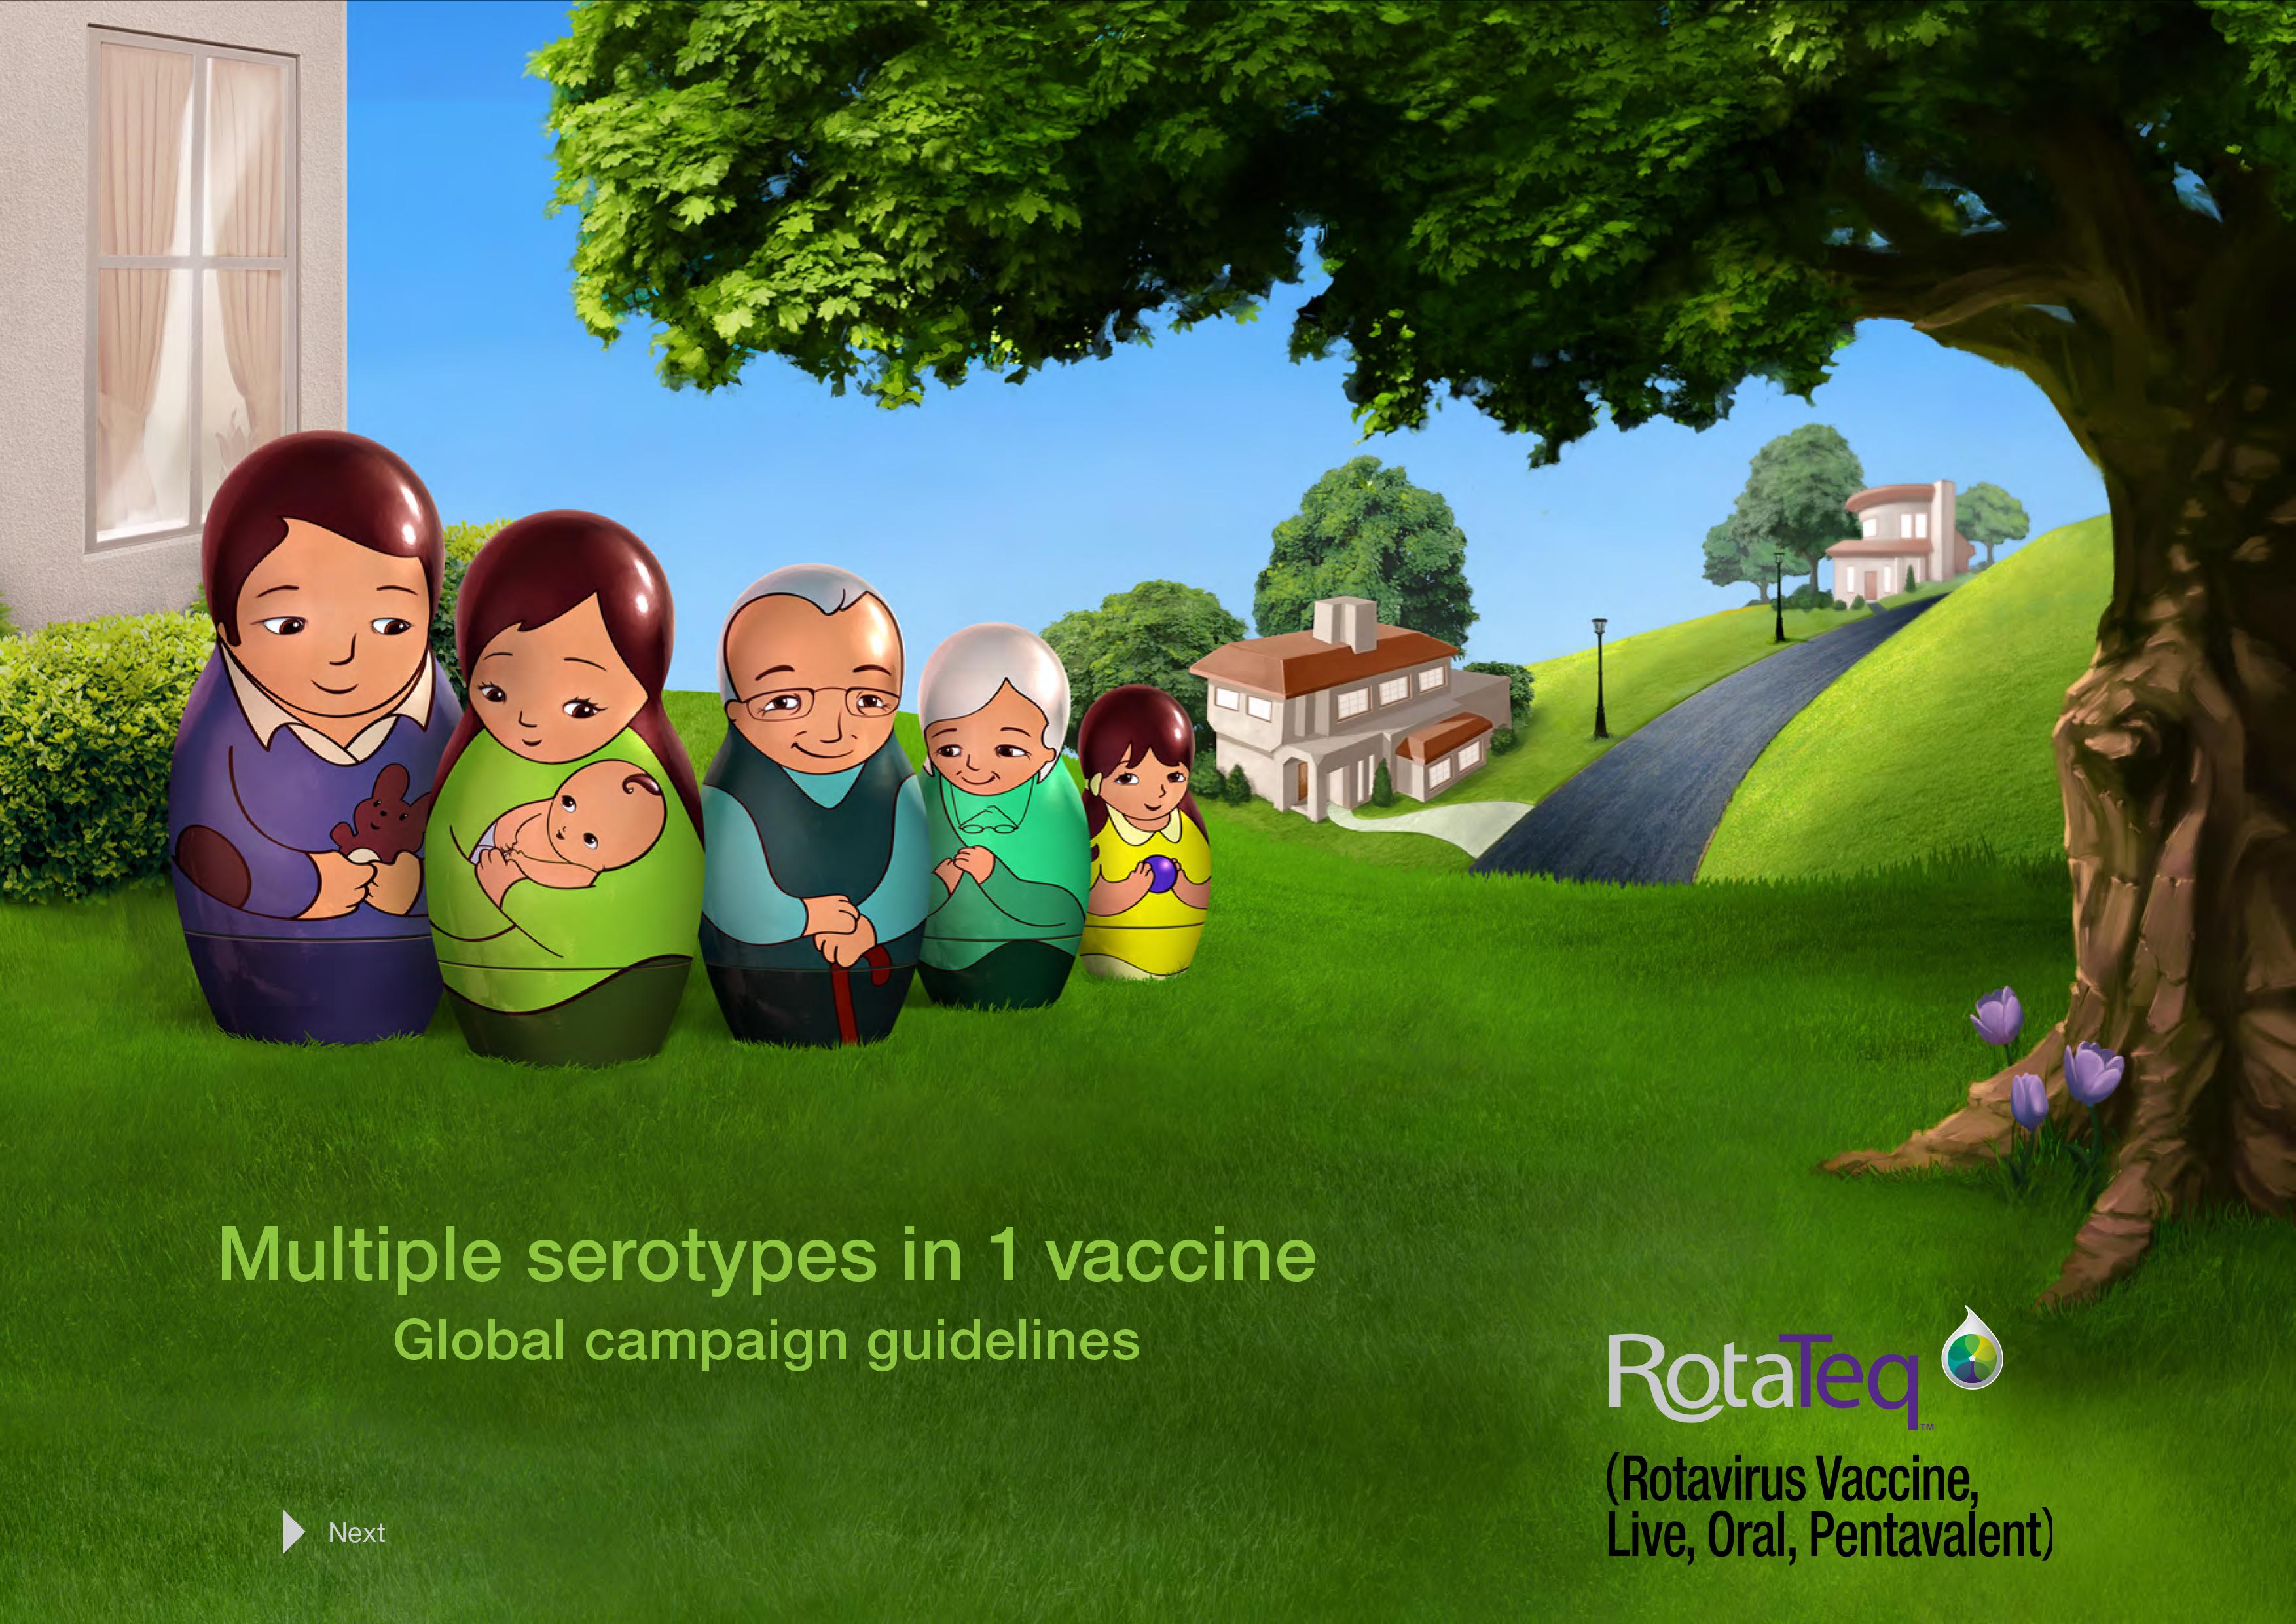 RotaTeq brand campaign